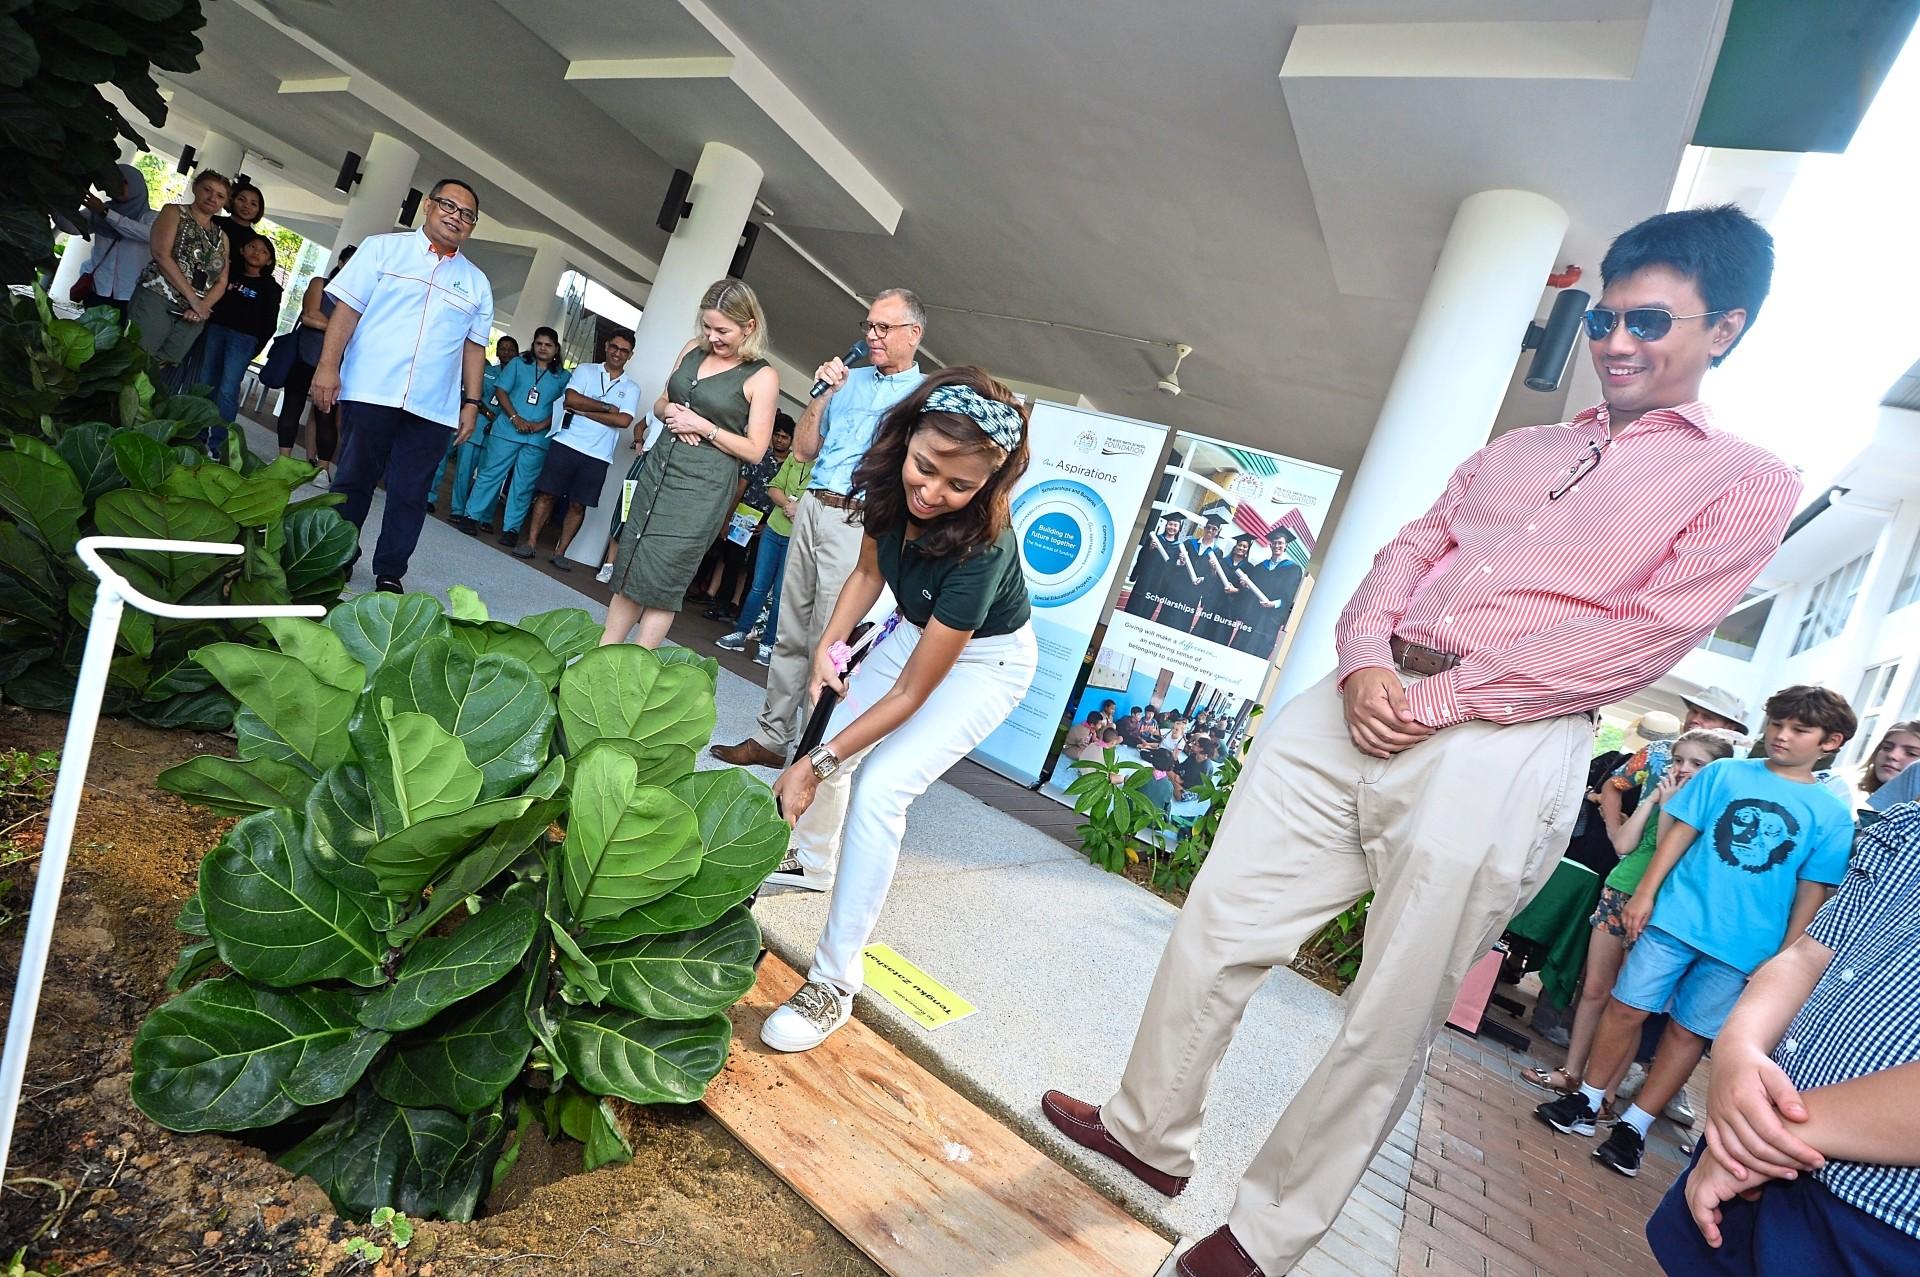 Tengku Zatashah planting a merbau tree at the school's foyer while school alumni Tunku Zain Al-'Abidin (right) looks on.